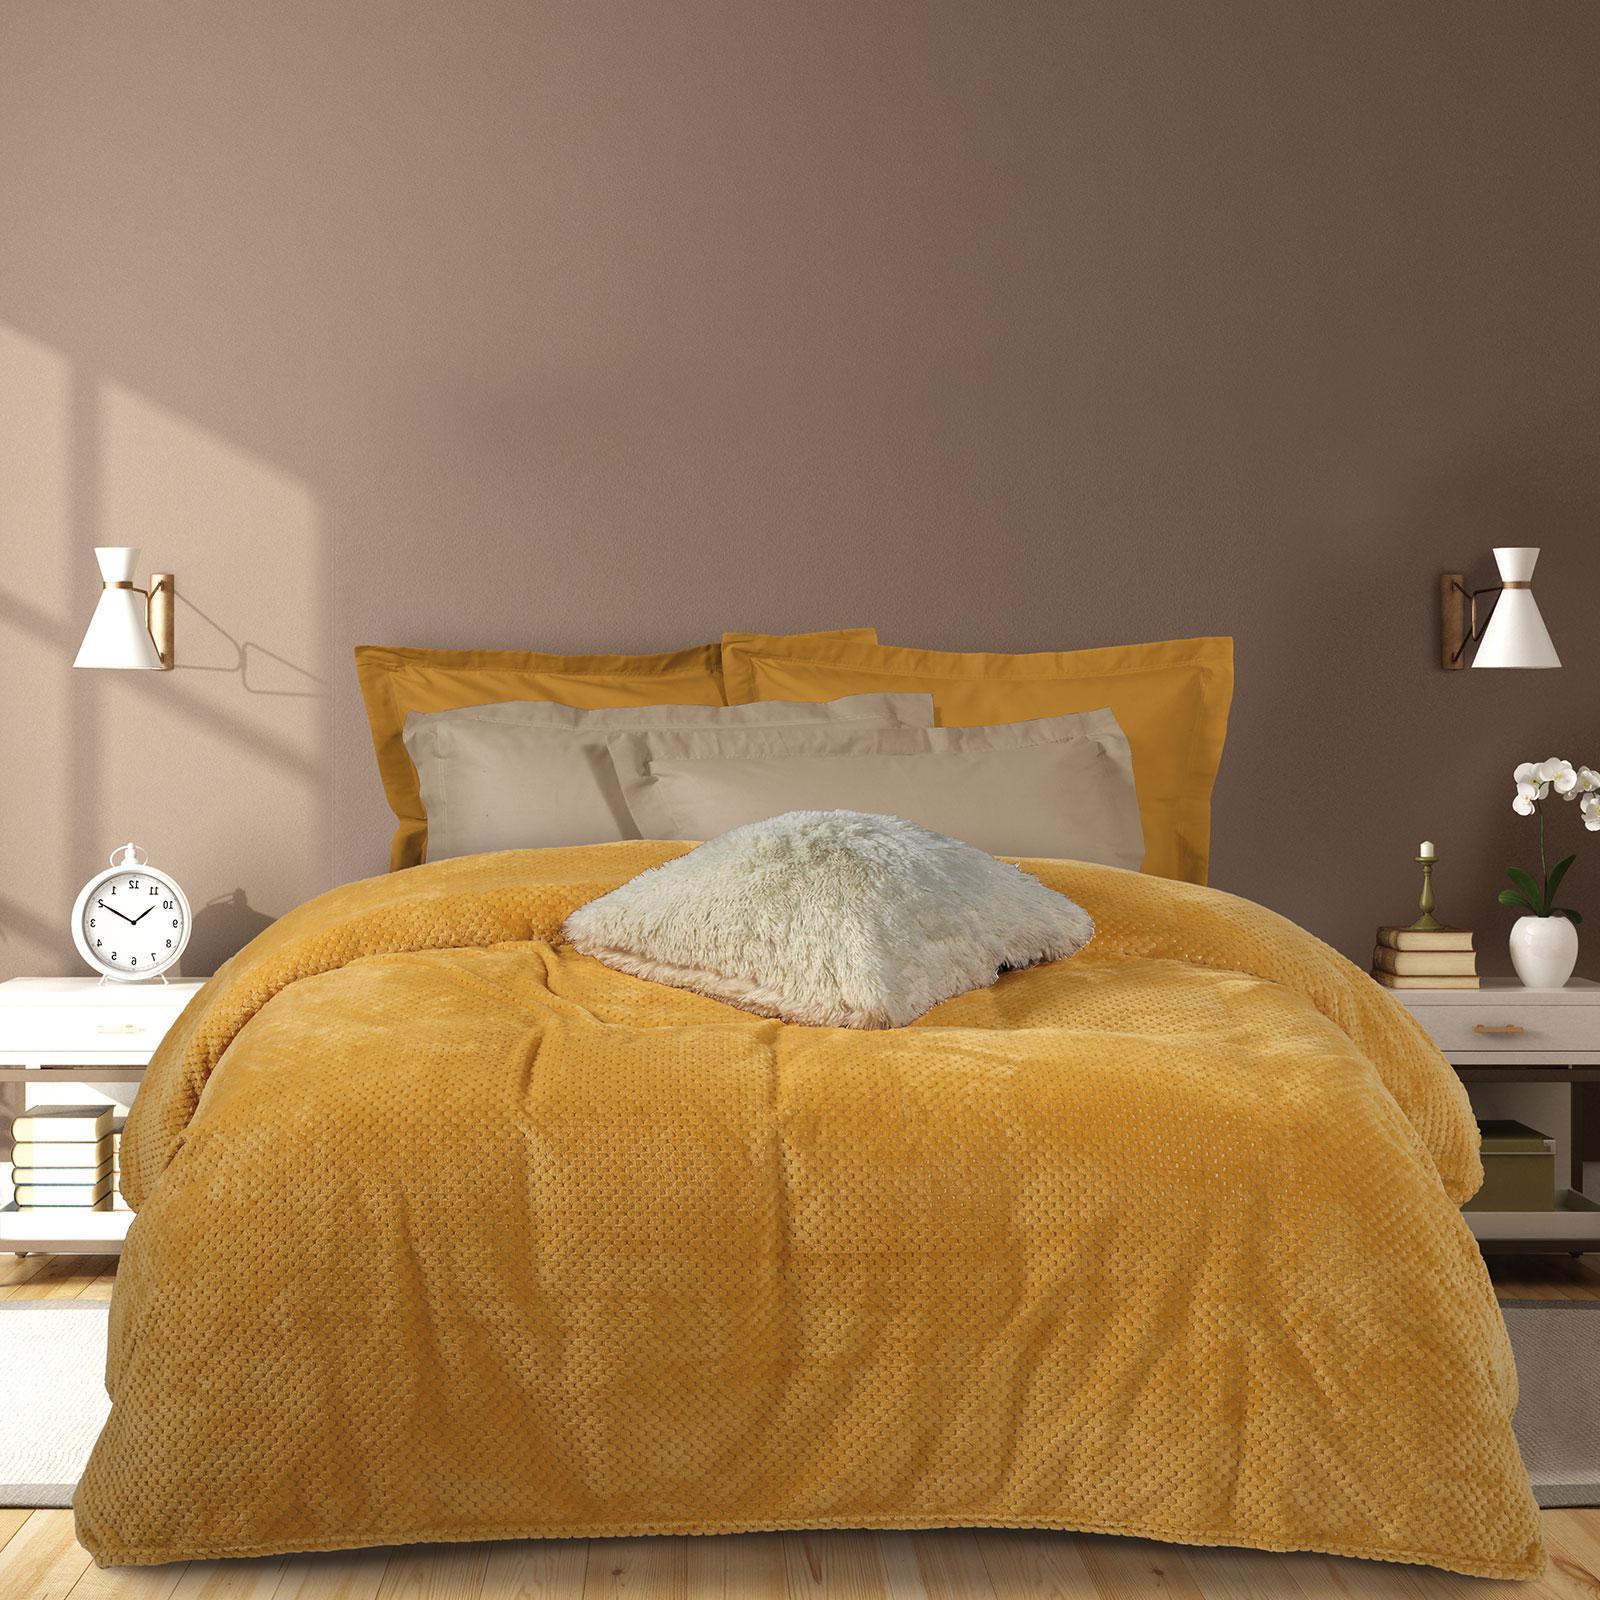 Das Home Κουβερτα Fleece 220Χ240 0466 Ωχρα